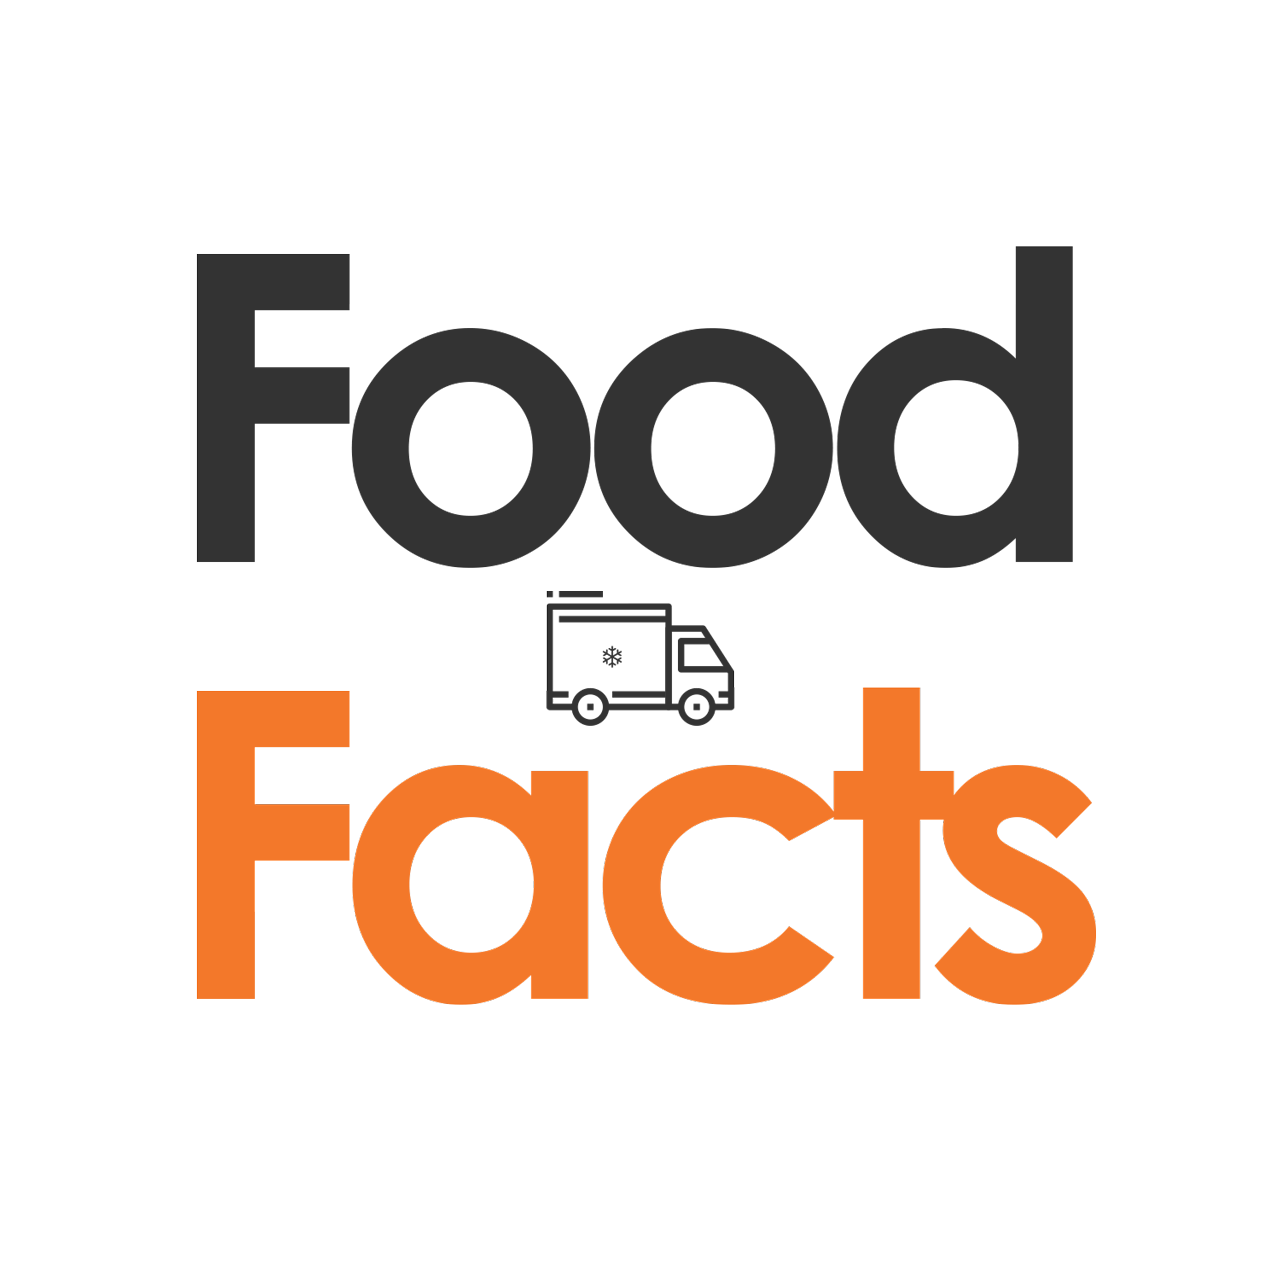 foodfacts Διανομή γαλακτοκομικών προϊόντων ΝΟΥΝΟΥ